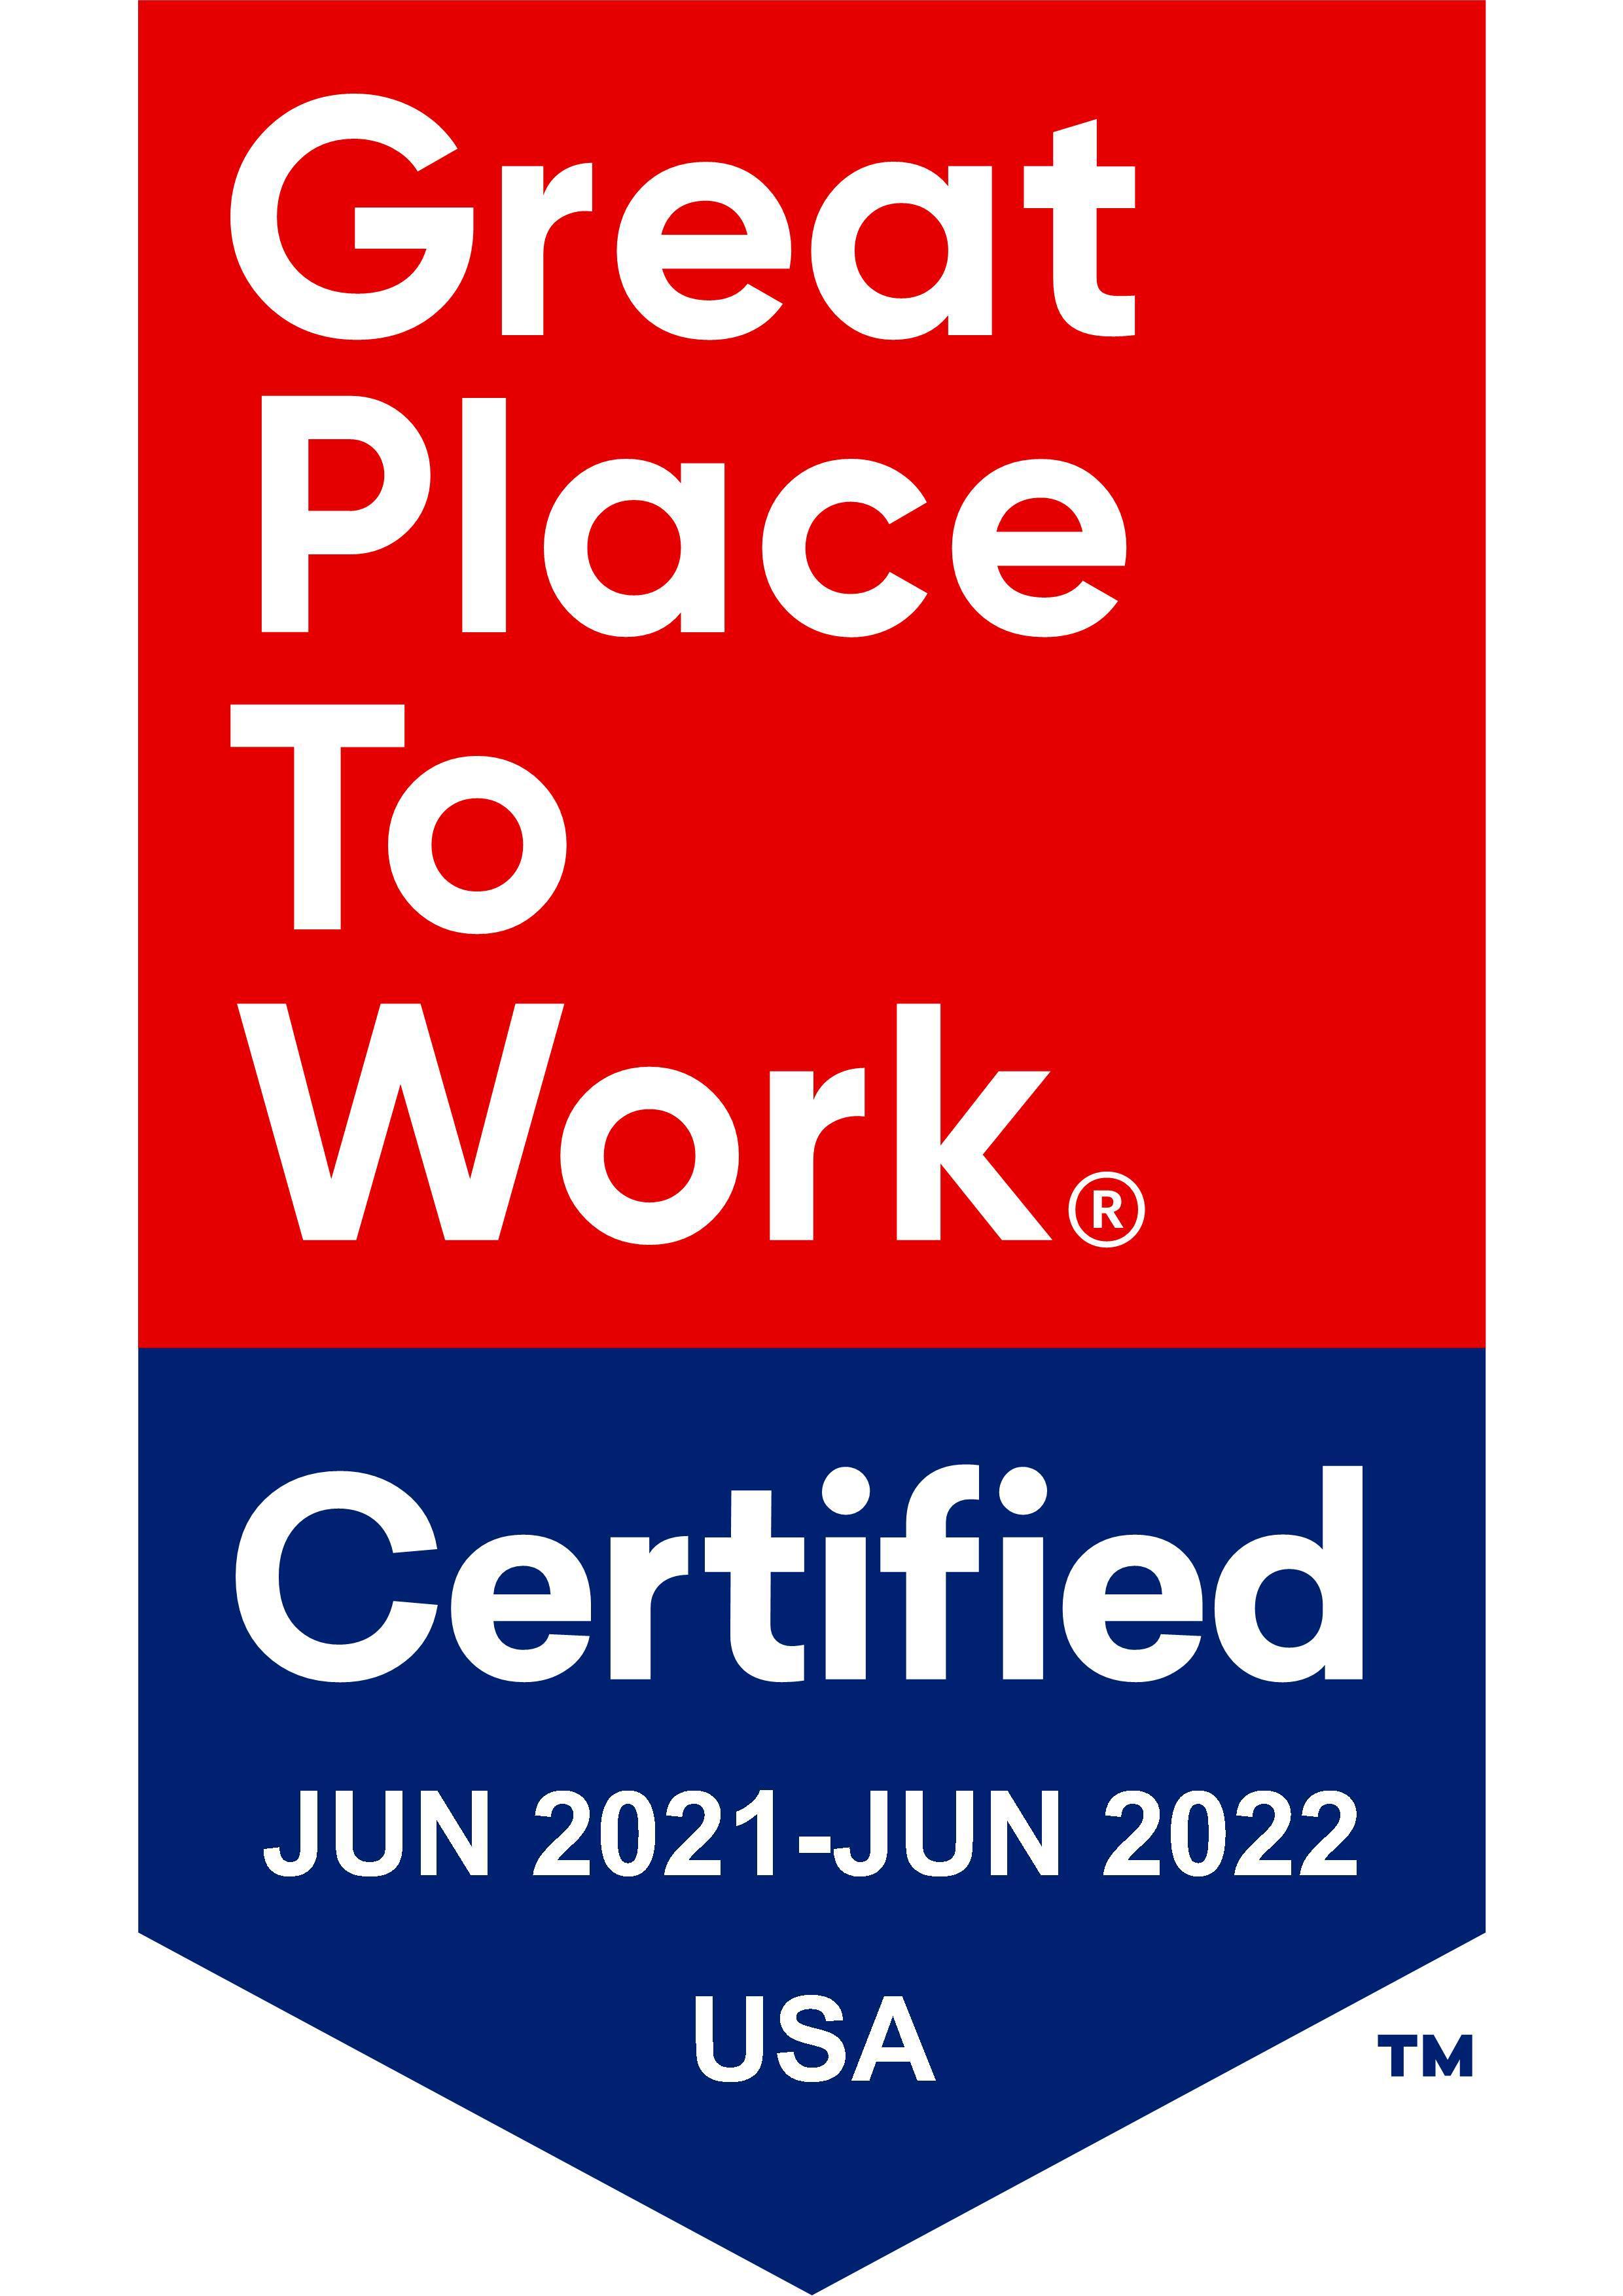 Mary Washington Healthcare 2021 Certification